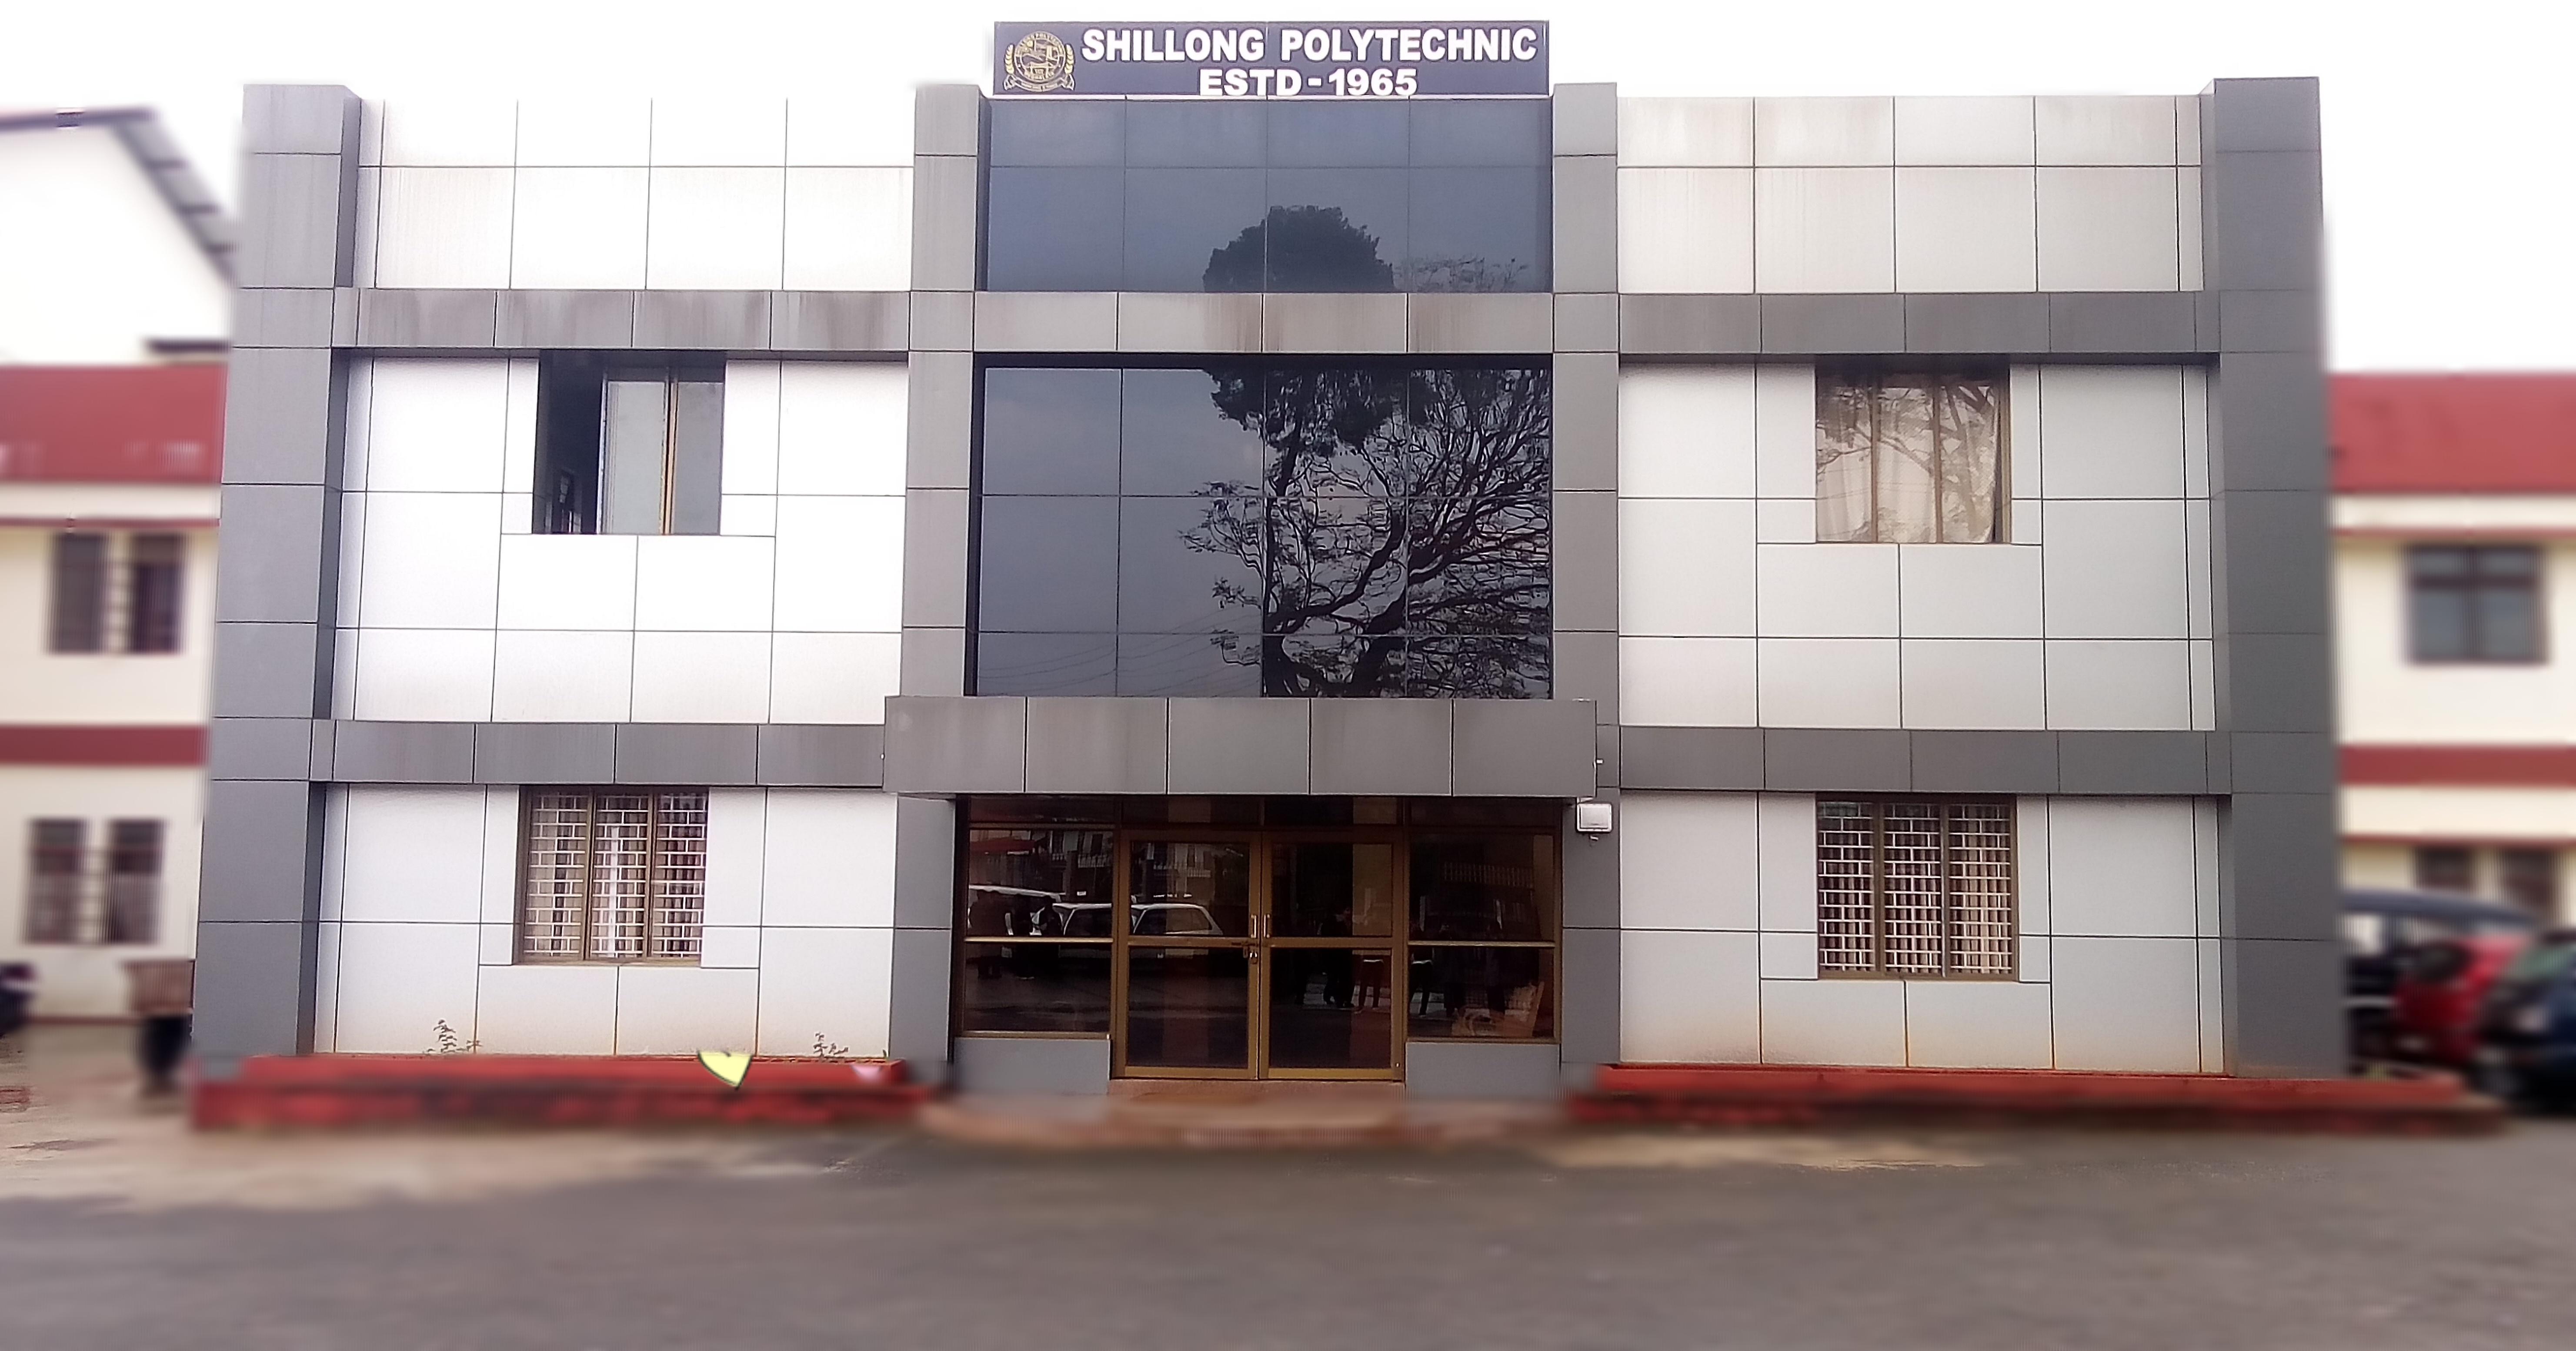 SHILLONG POLYTECHNIC